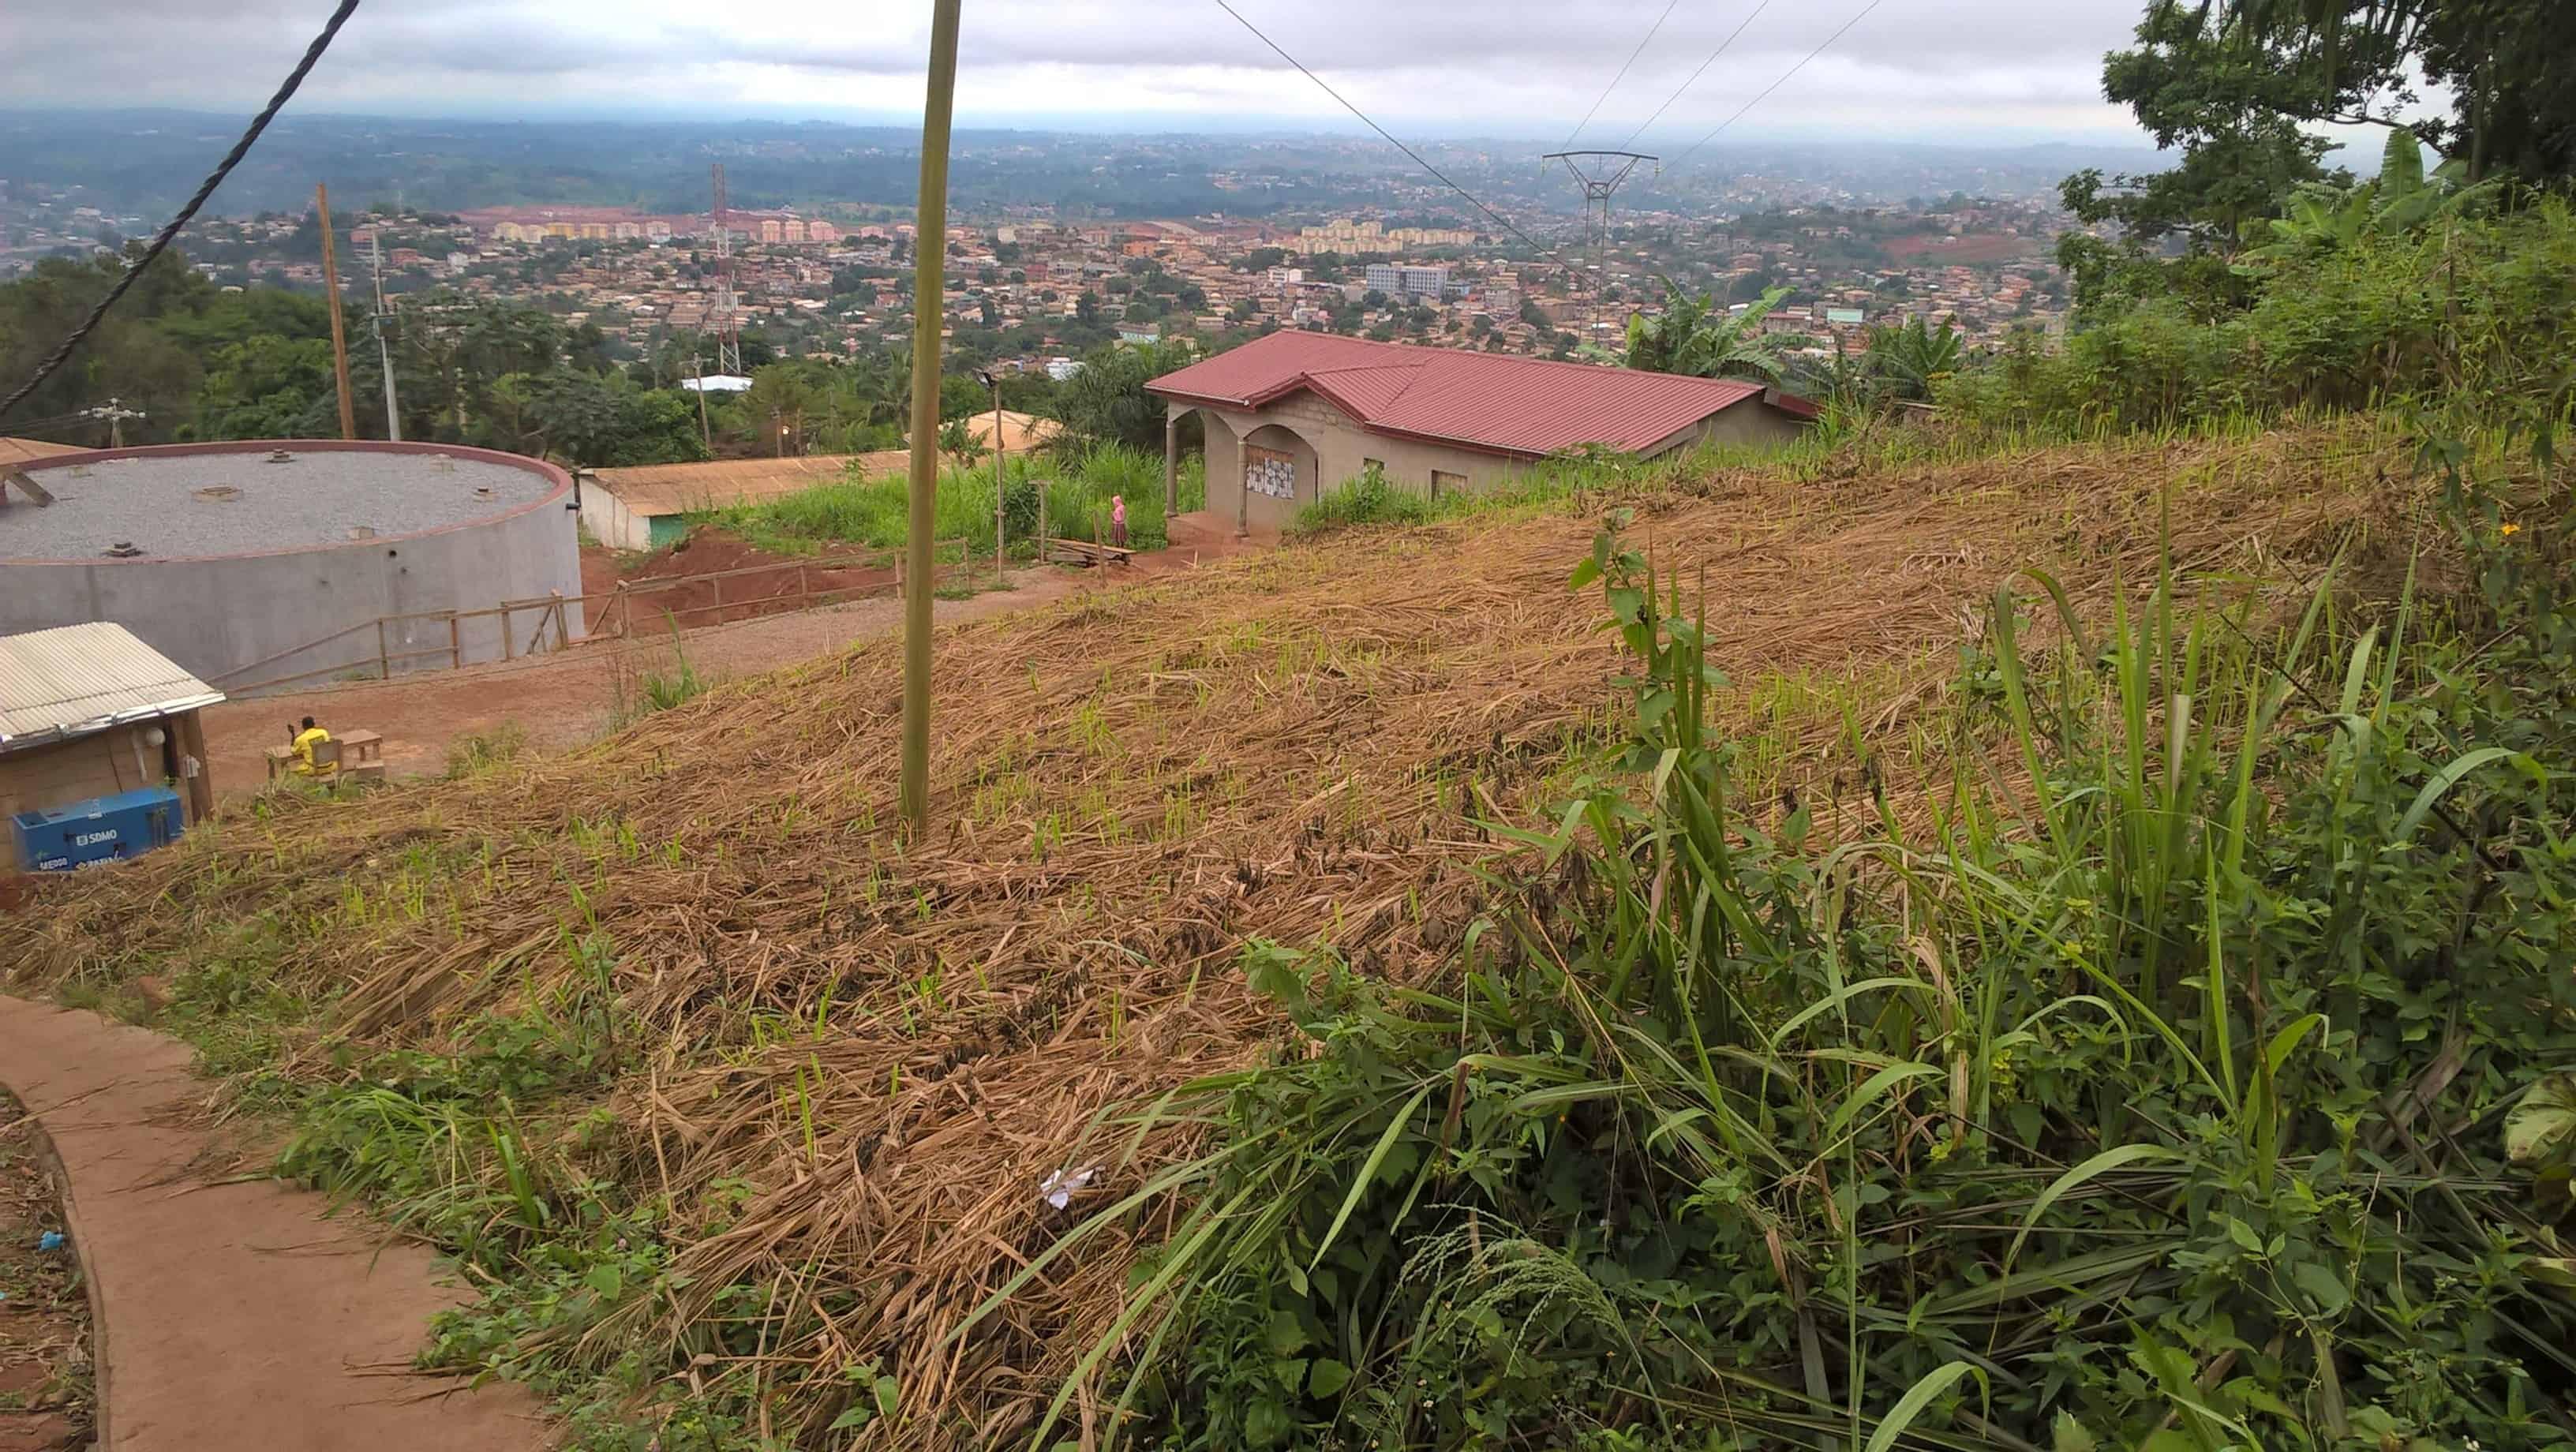 Land for sale at Yaoundé, Messassi, Nkolndobo - 500 m2 - 9 000 000 FCFA